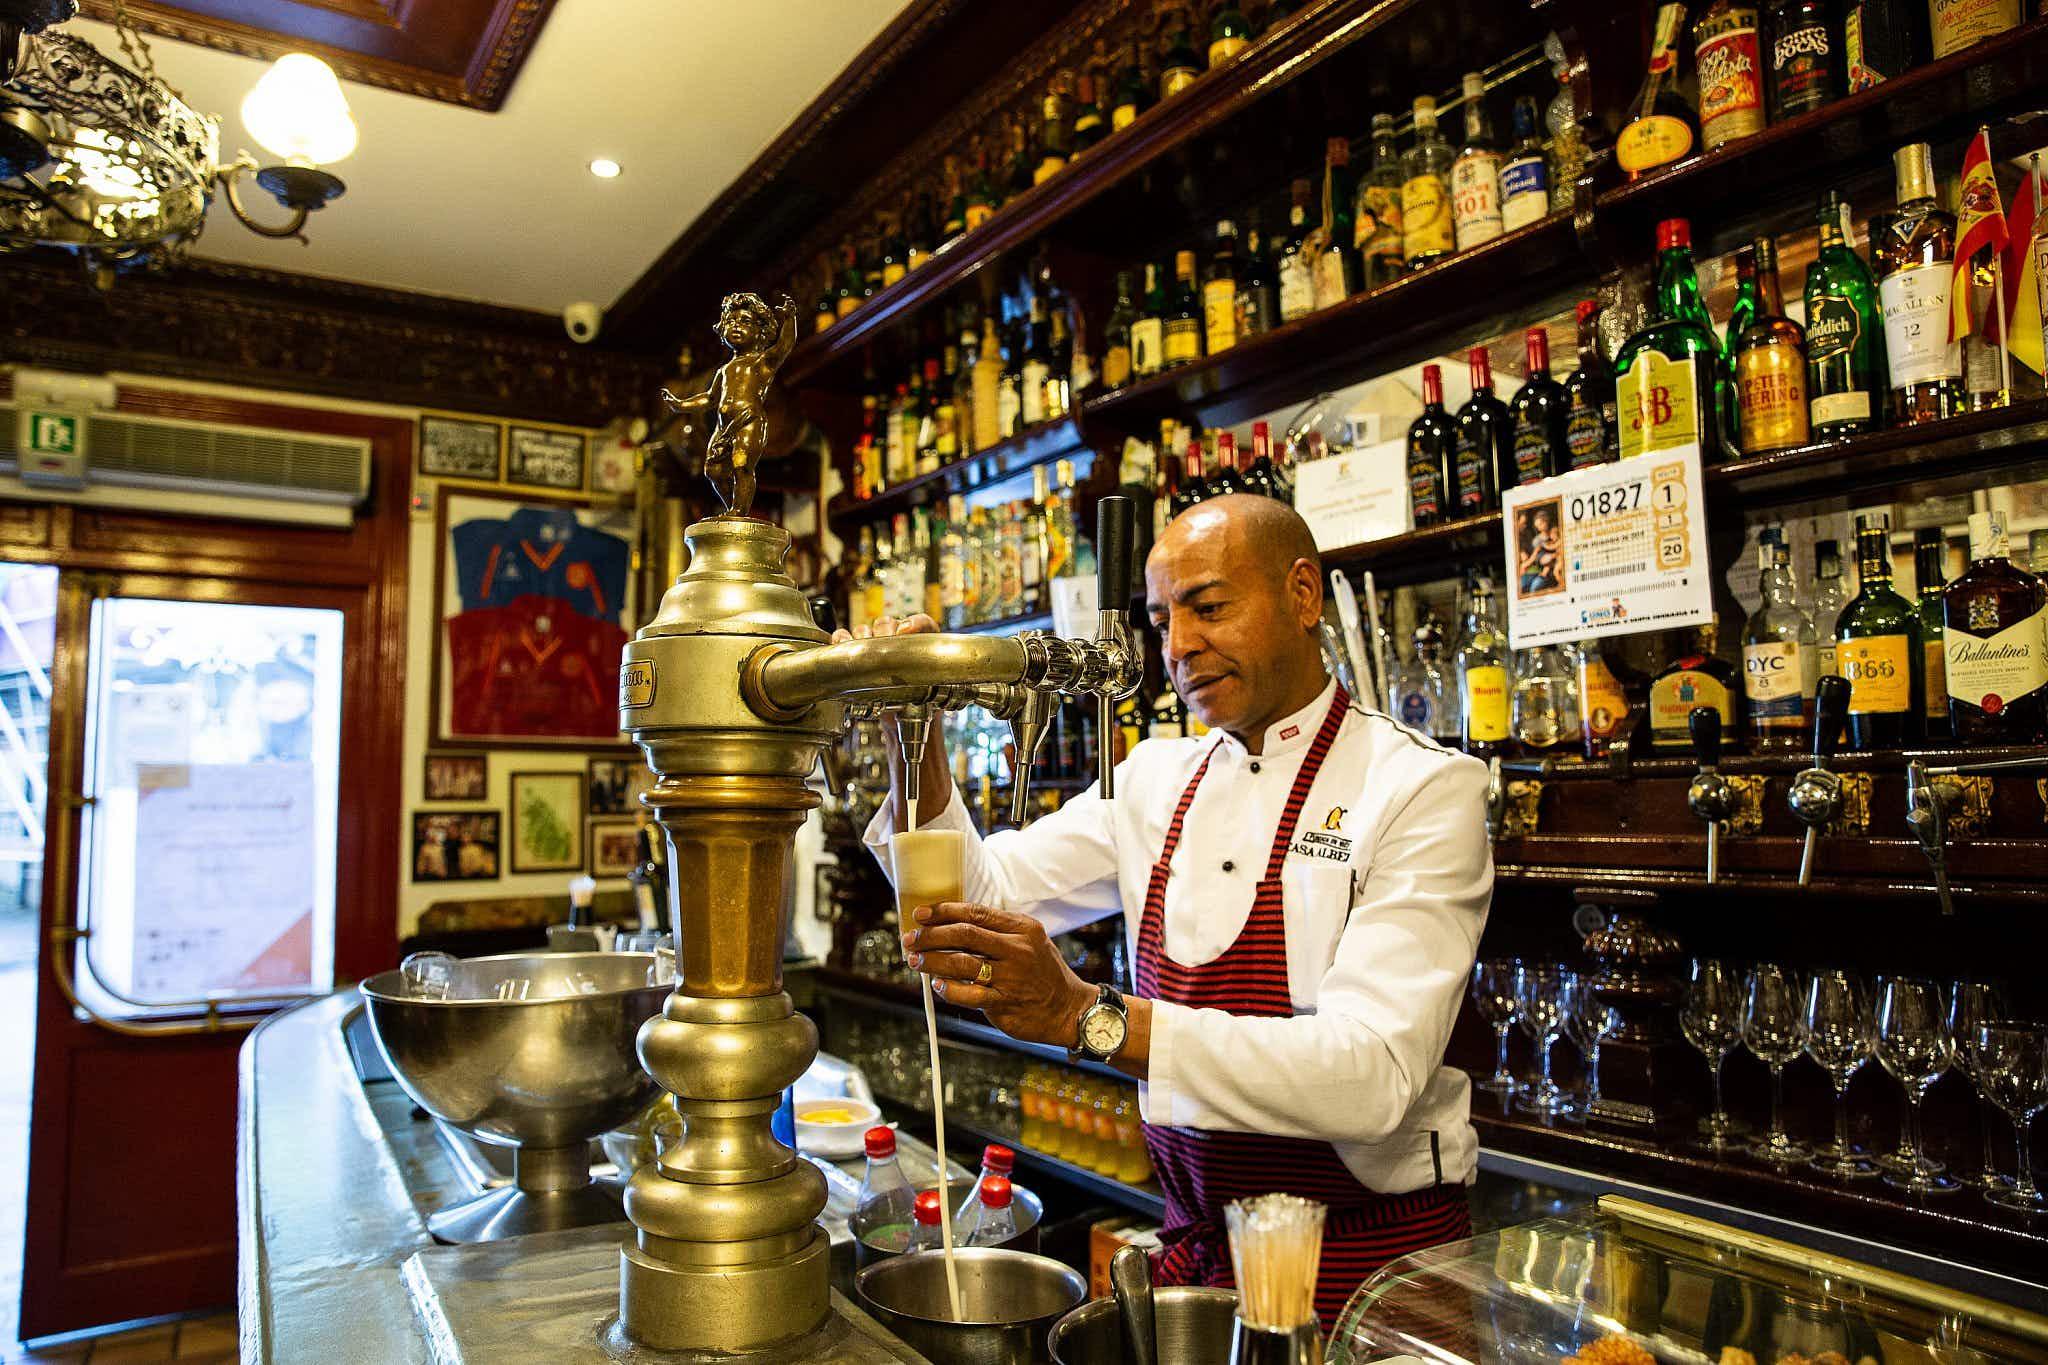 Madrid's oldest restaurants and bars offer tapas, vino and history